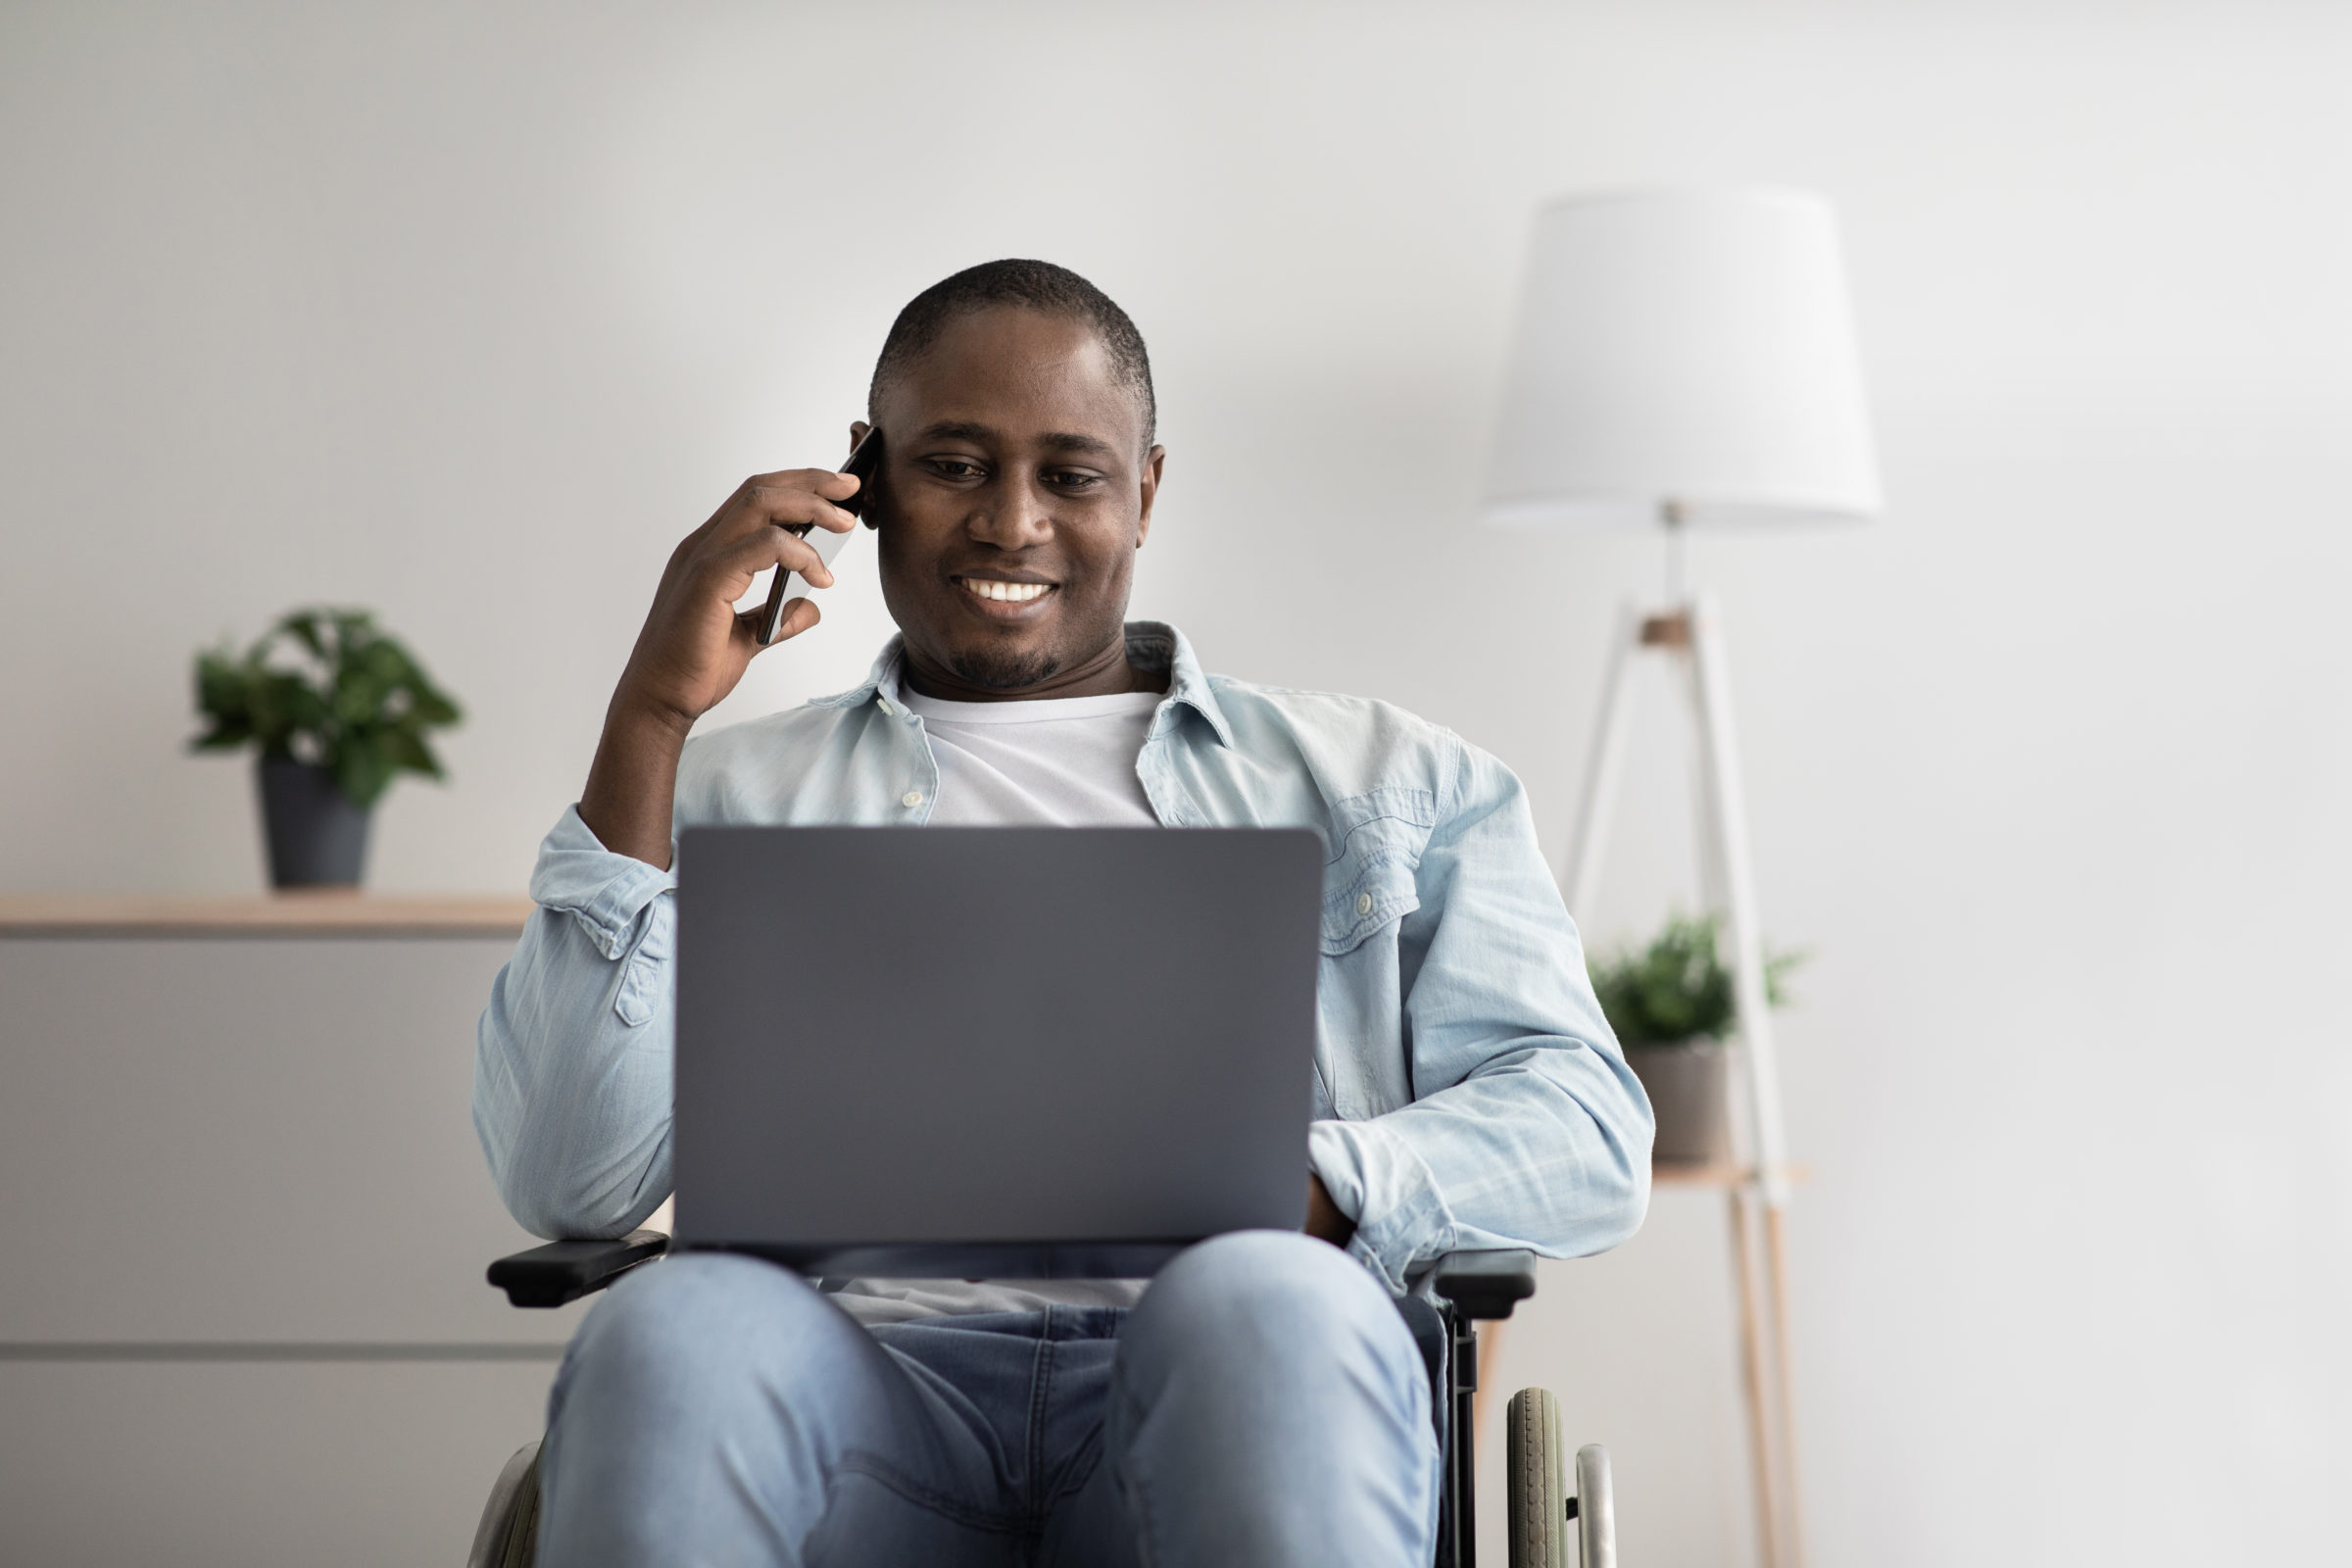 manager works remotely online business and gadgets DKG3DJF